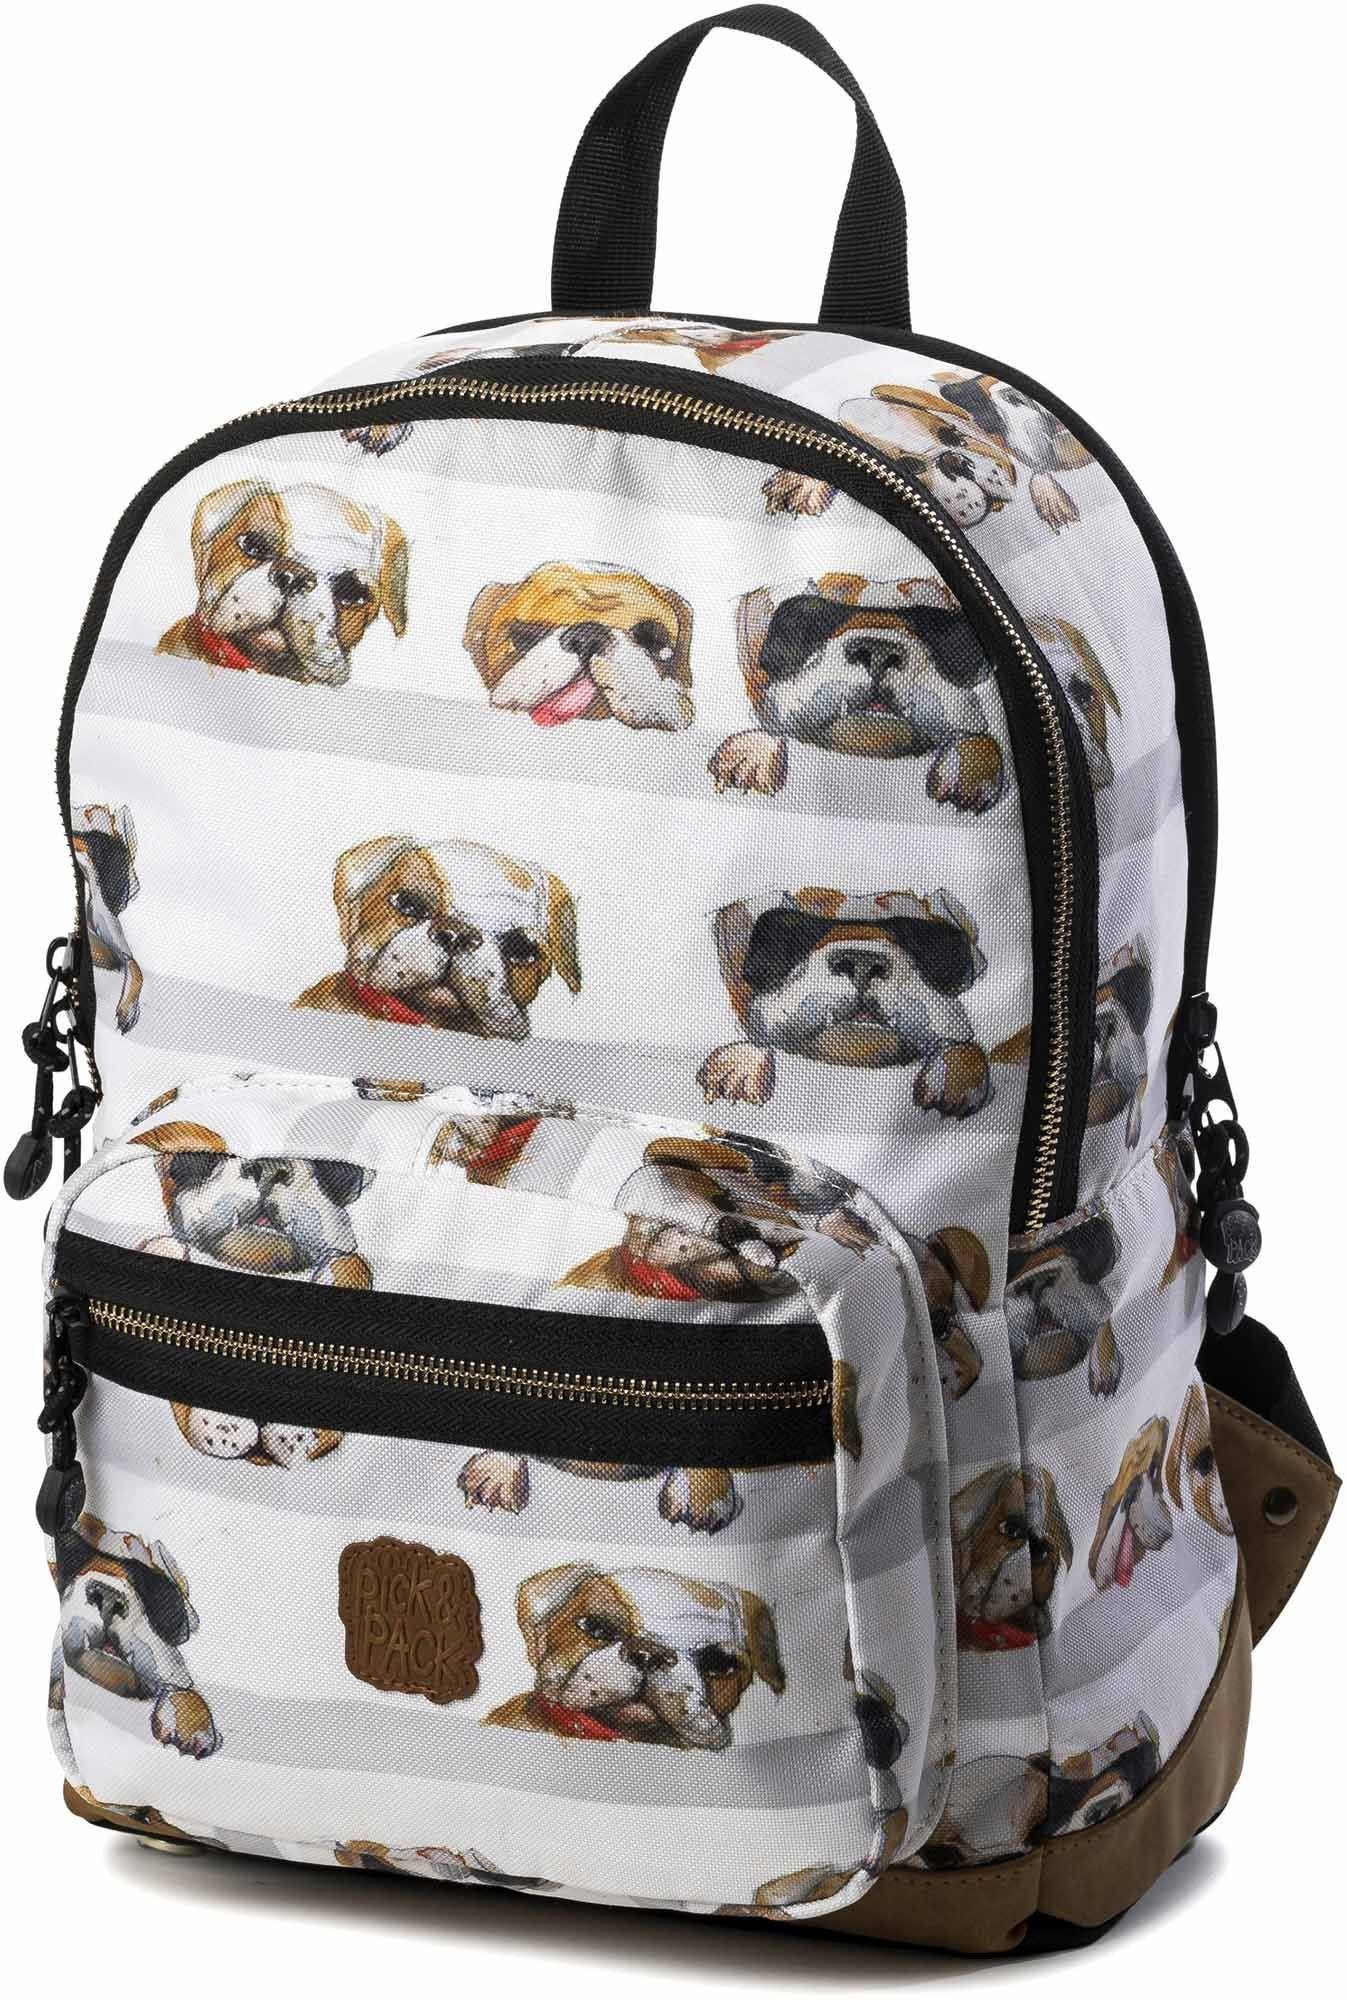 Pick & Pack Ryggsäck Hund, White